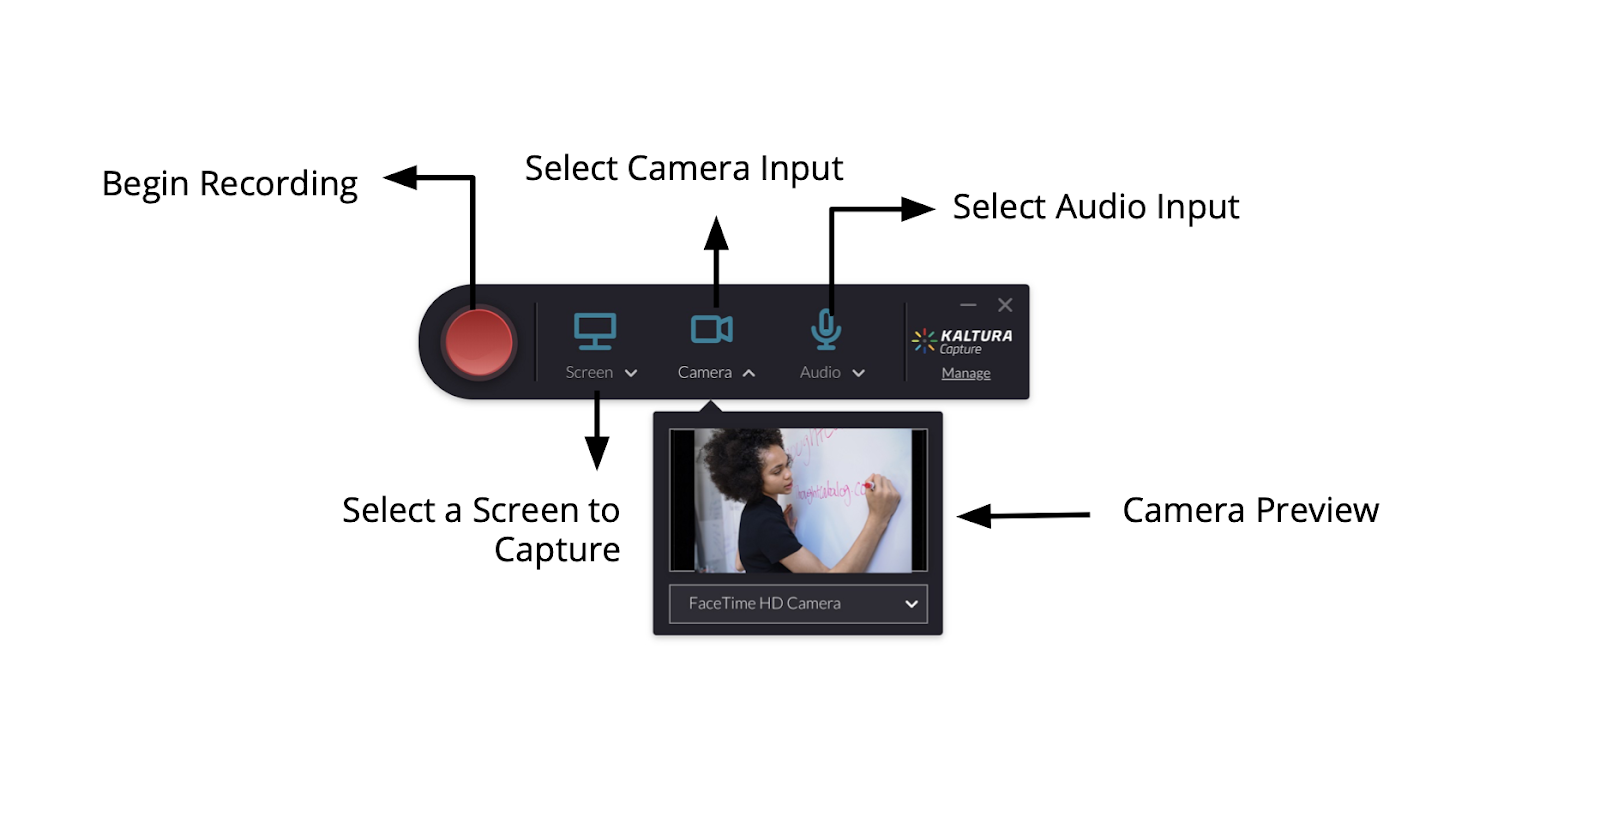 Control panel for Kaltura Capture Tool